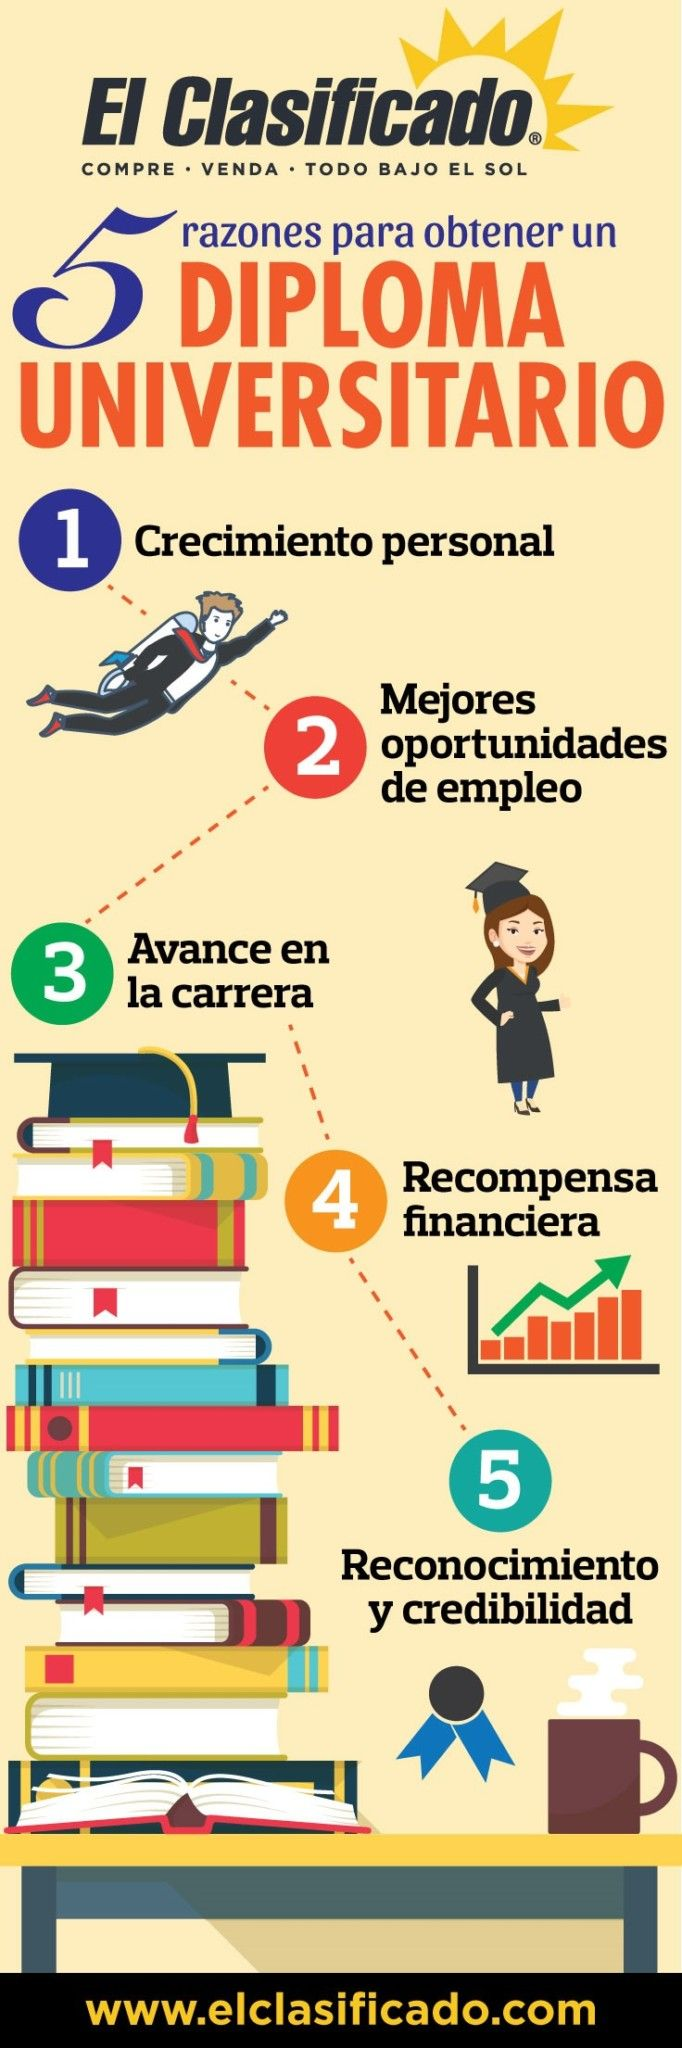 5 razones para obtener un diploma universitatio